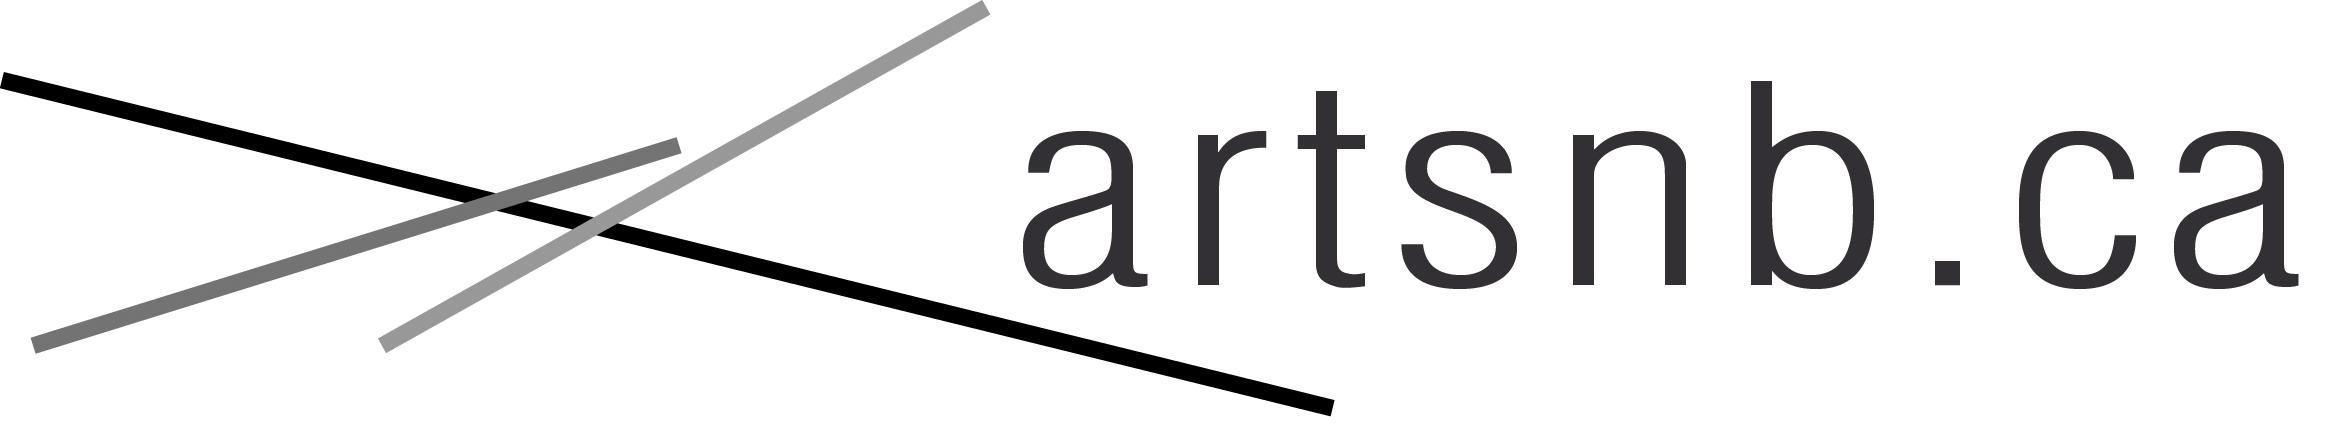 artsnb_logo_bw.jpg